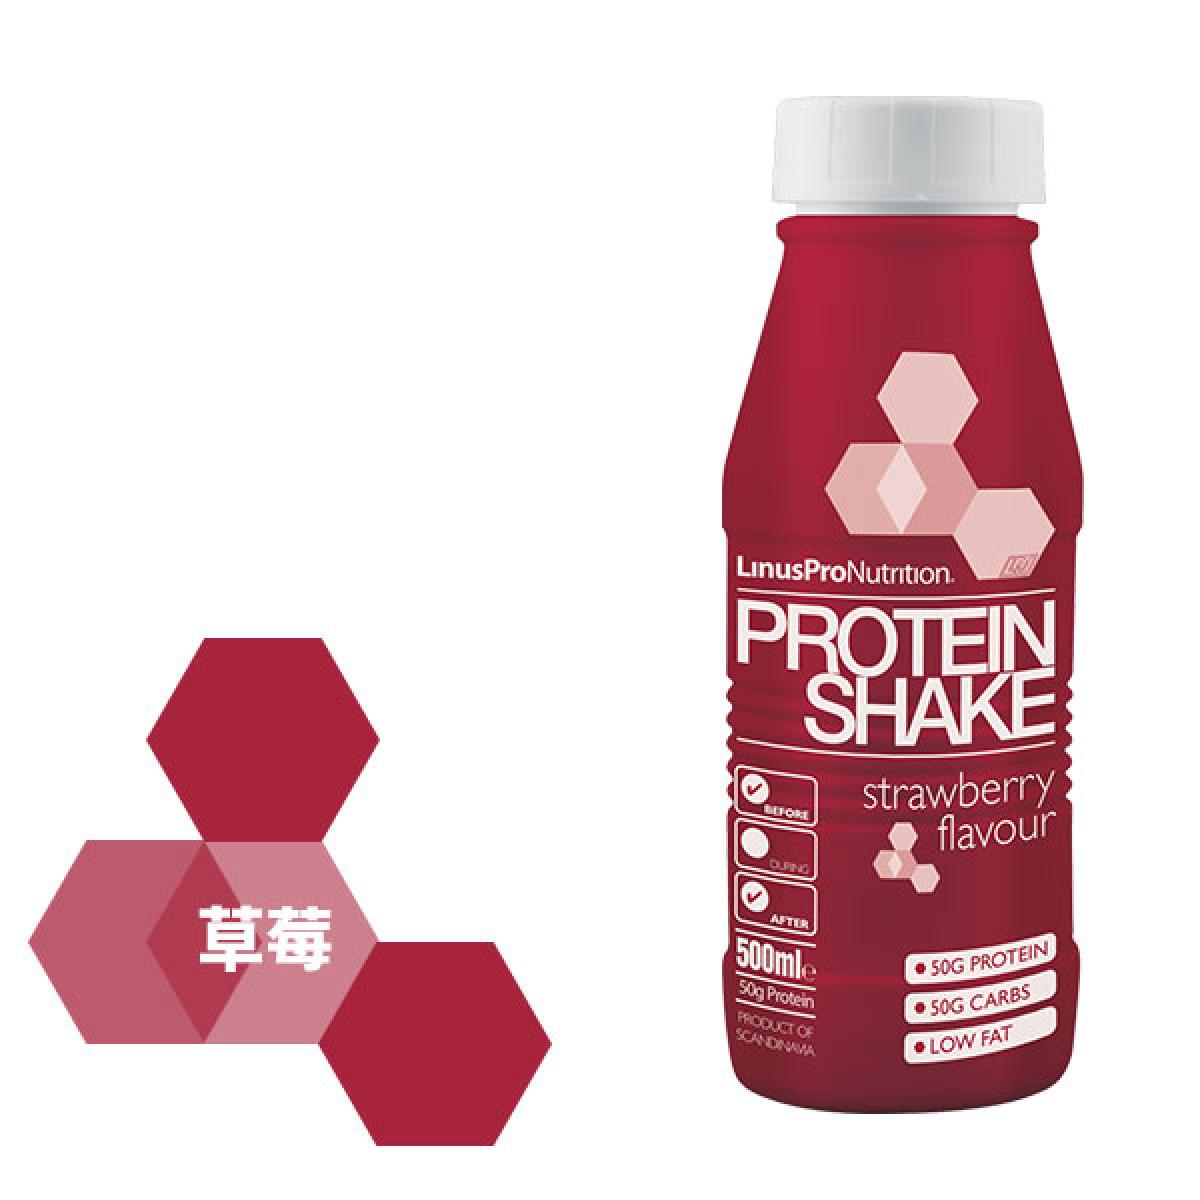 LinusPro 丹麥製造 Protein Shake 乳清 蛋白搖搖飲 500ml./罐